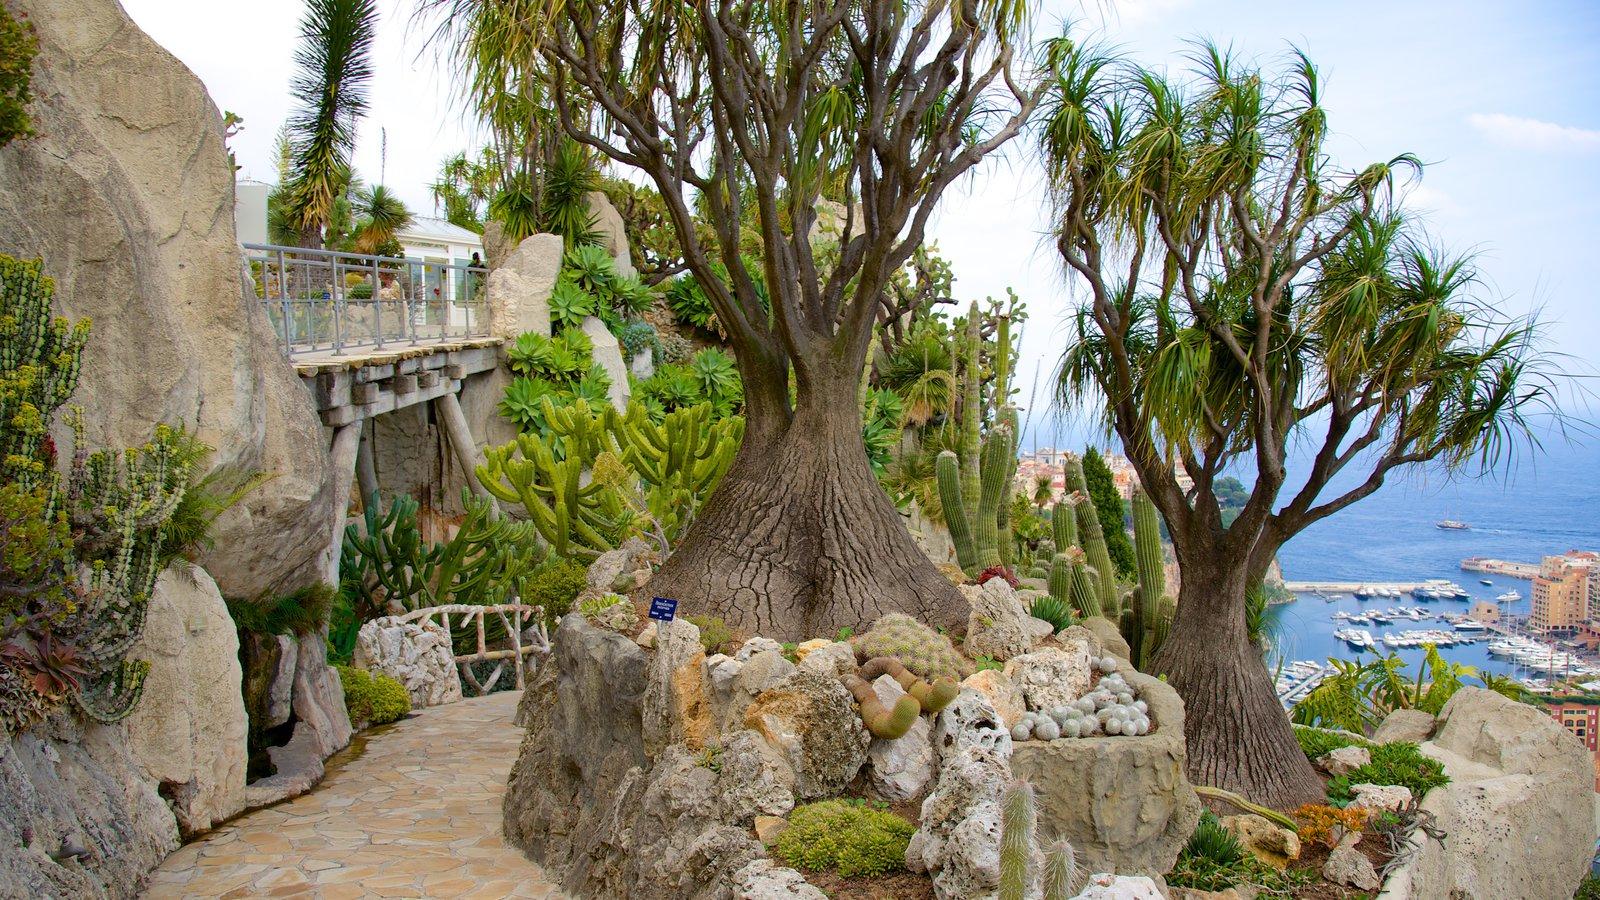 Exotic garden pictures view photos images of exotic garden for Jardin exotique monaco